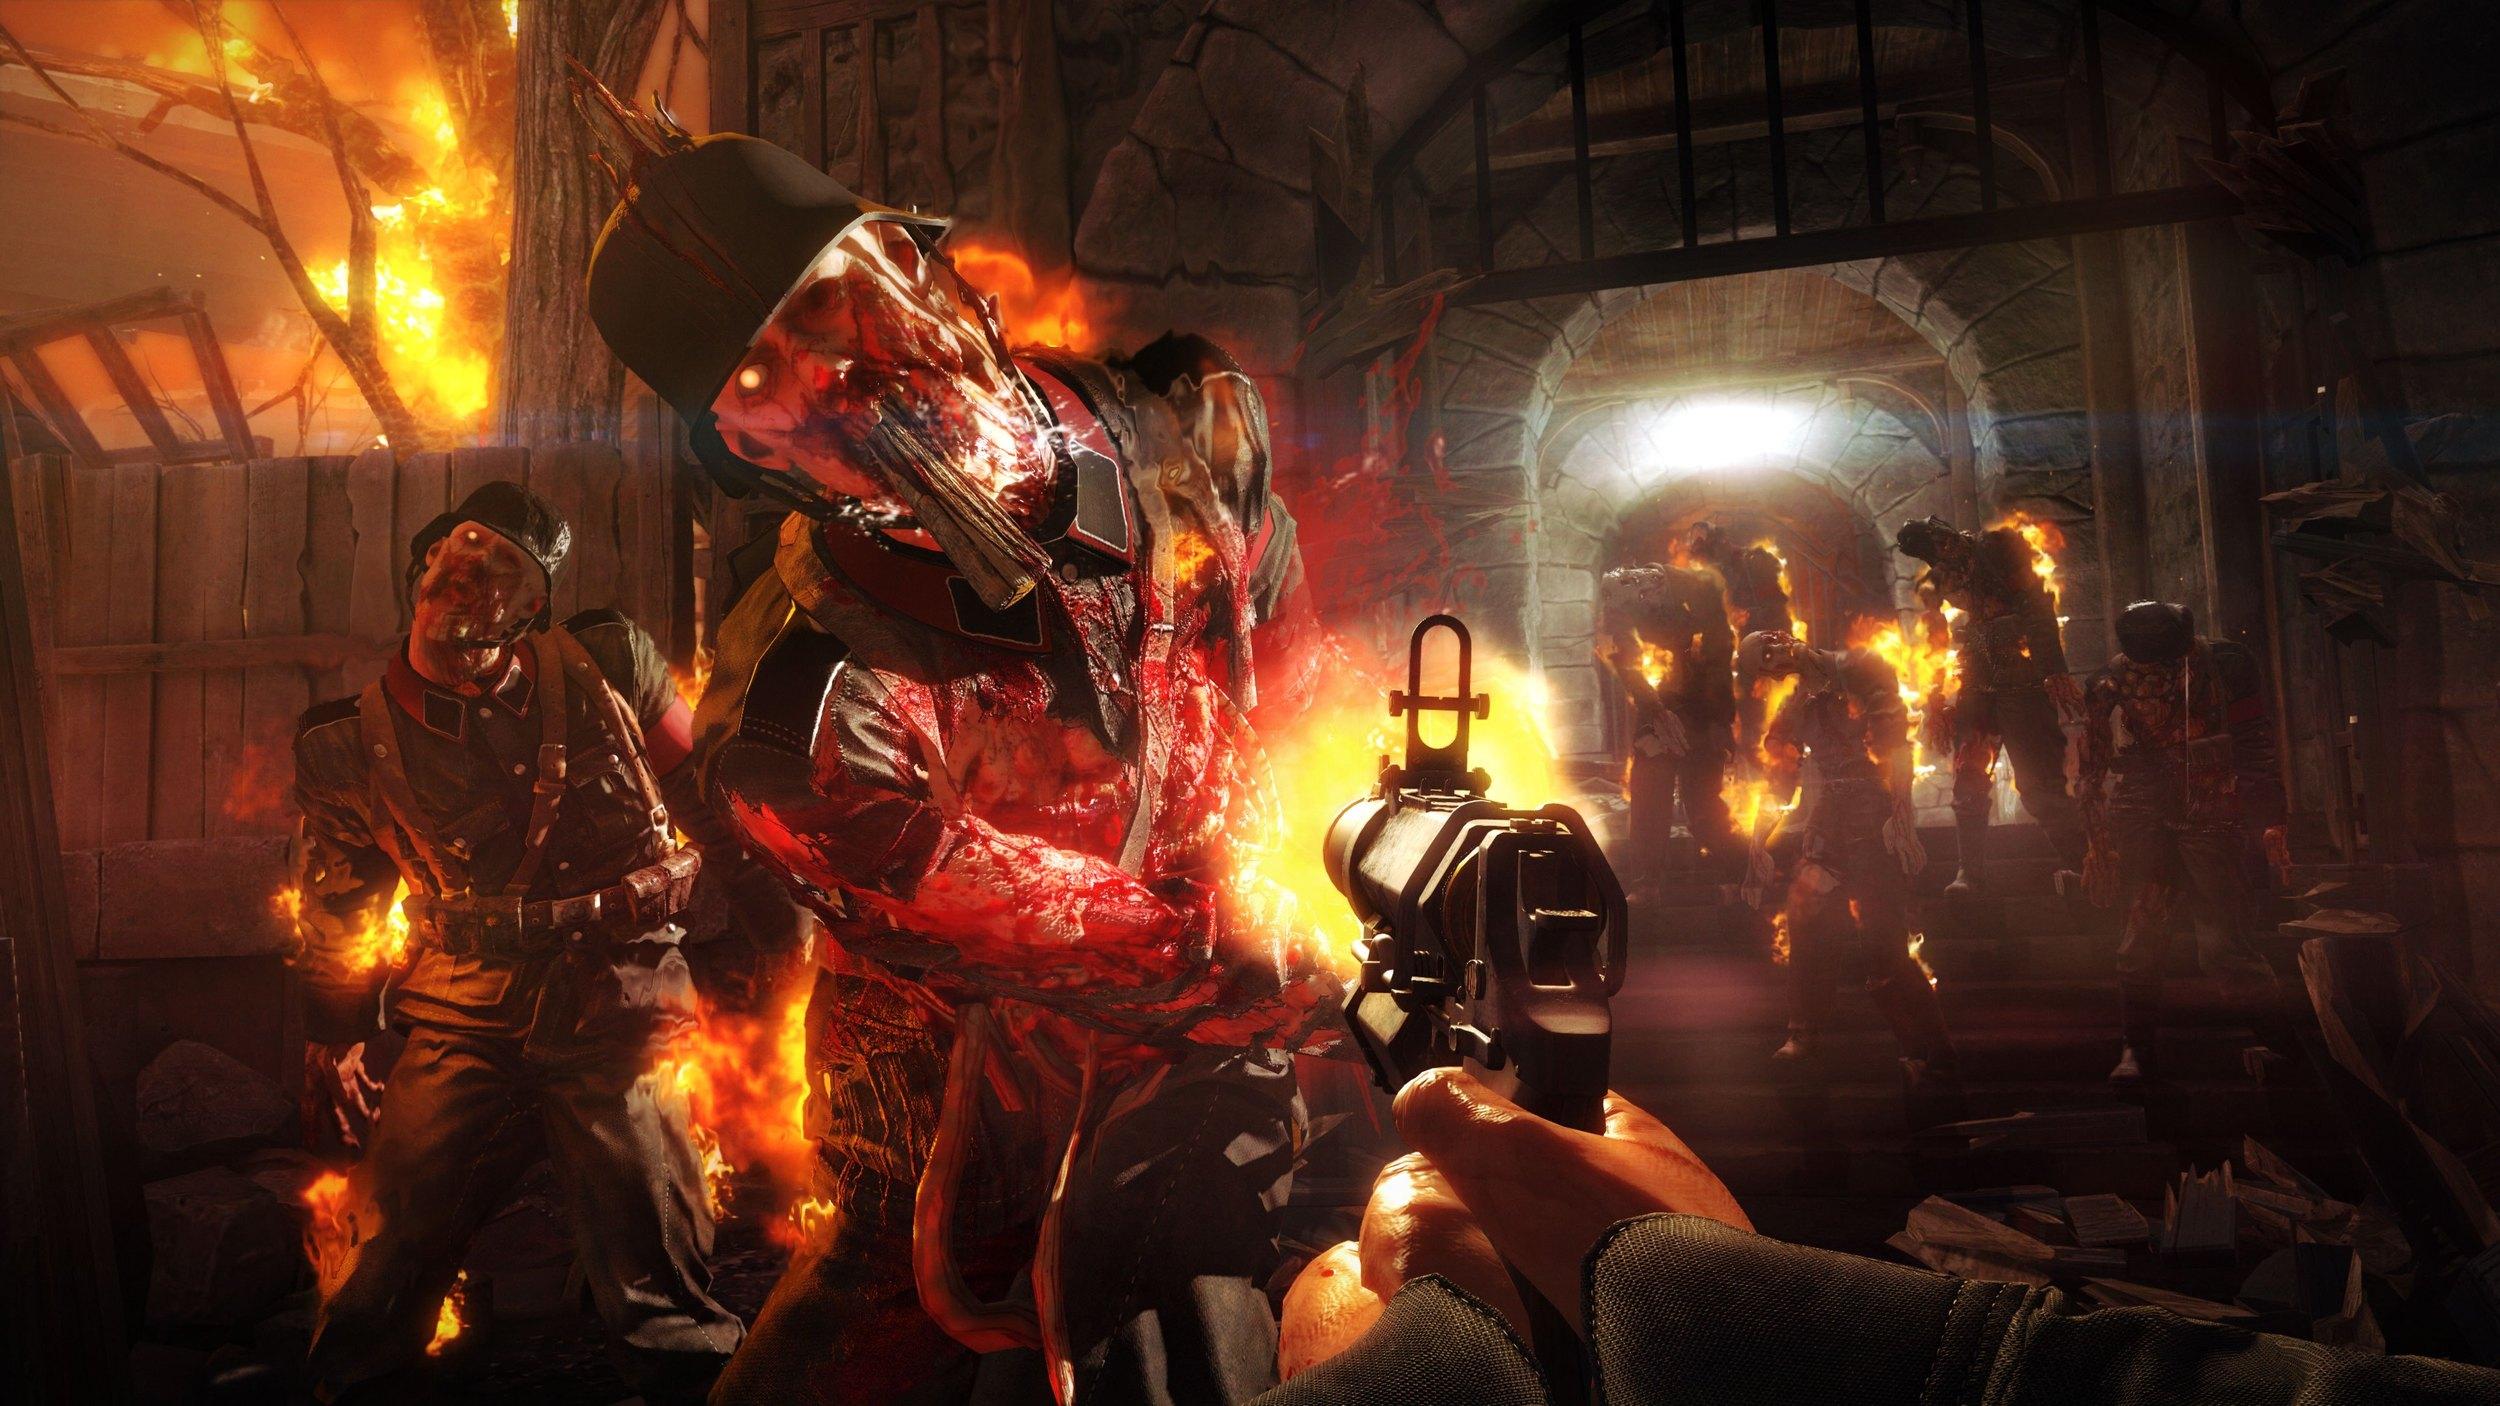 Wolfenstein-The-Old-Blood-Brings-Nazi-Zombies-Gets-Gameplay-Details-479592-5[1].jpg